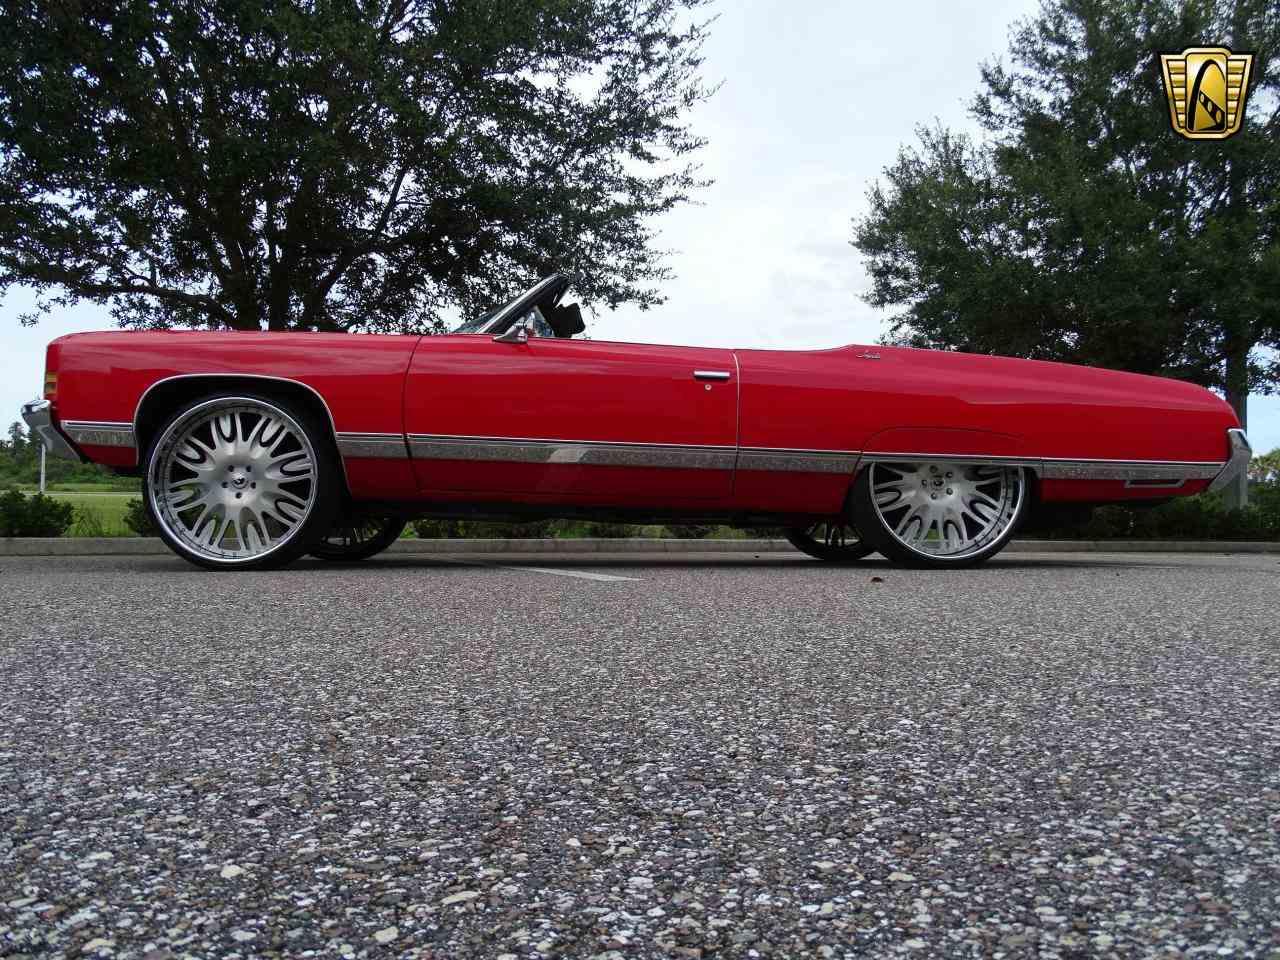 Impala 1972 chevrolet impala for sale : 1972 Chevrolet Impala for Sale | ClassicCars.com | CC-1014379